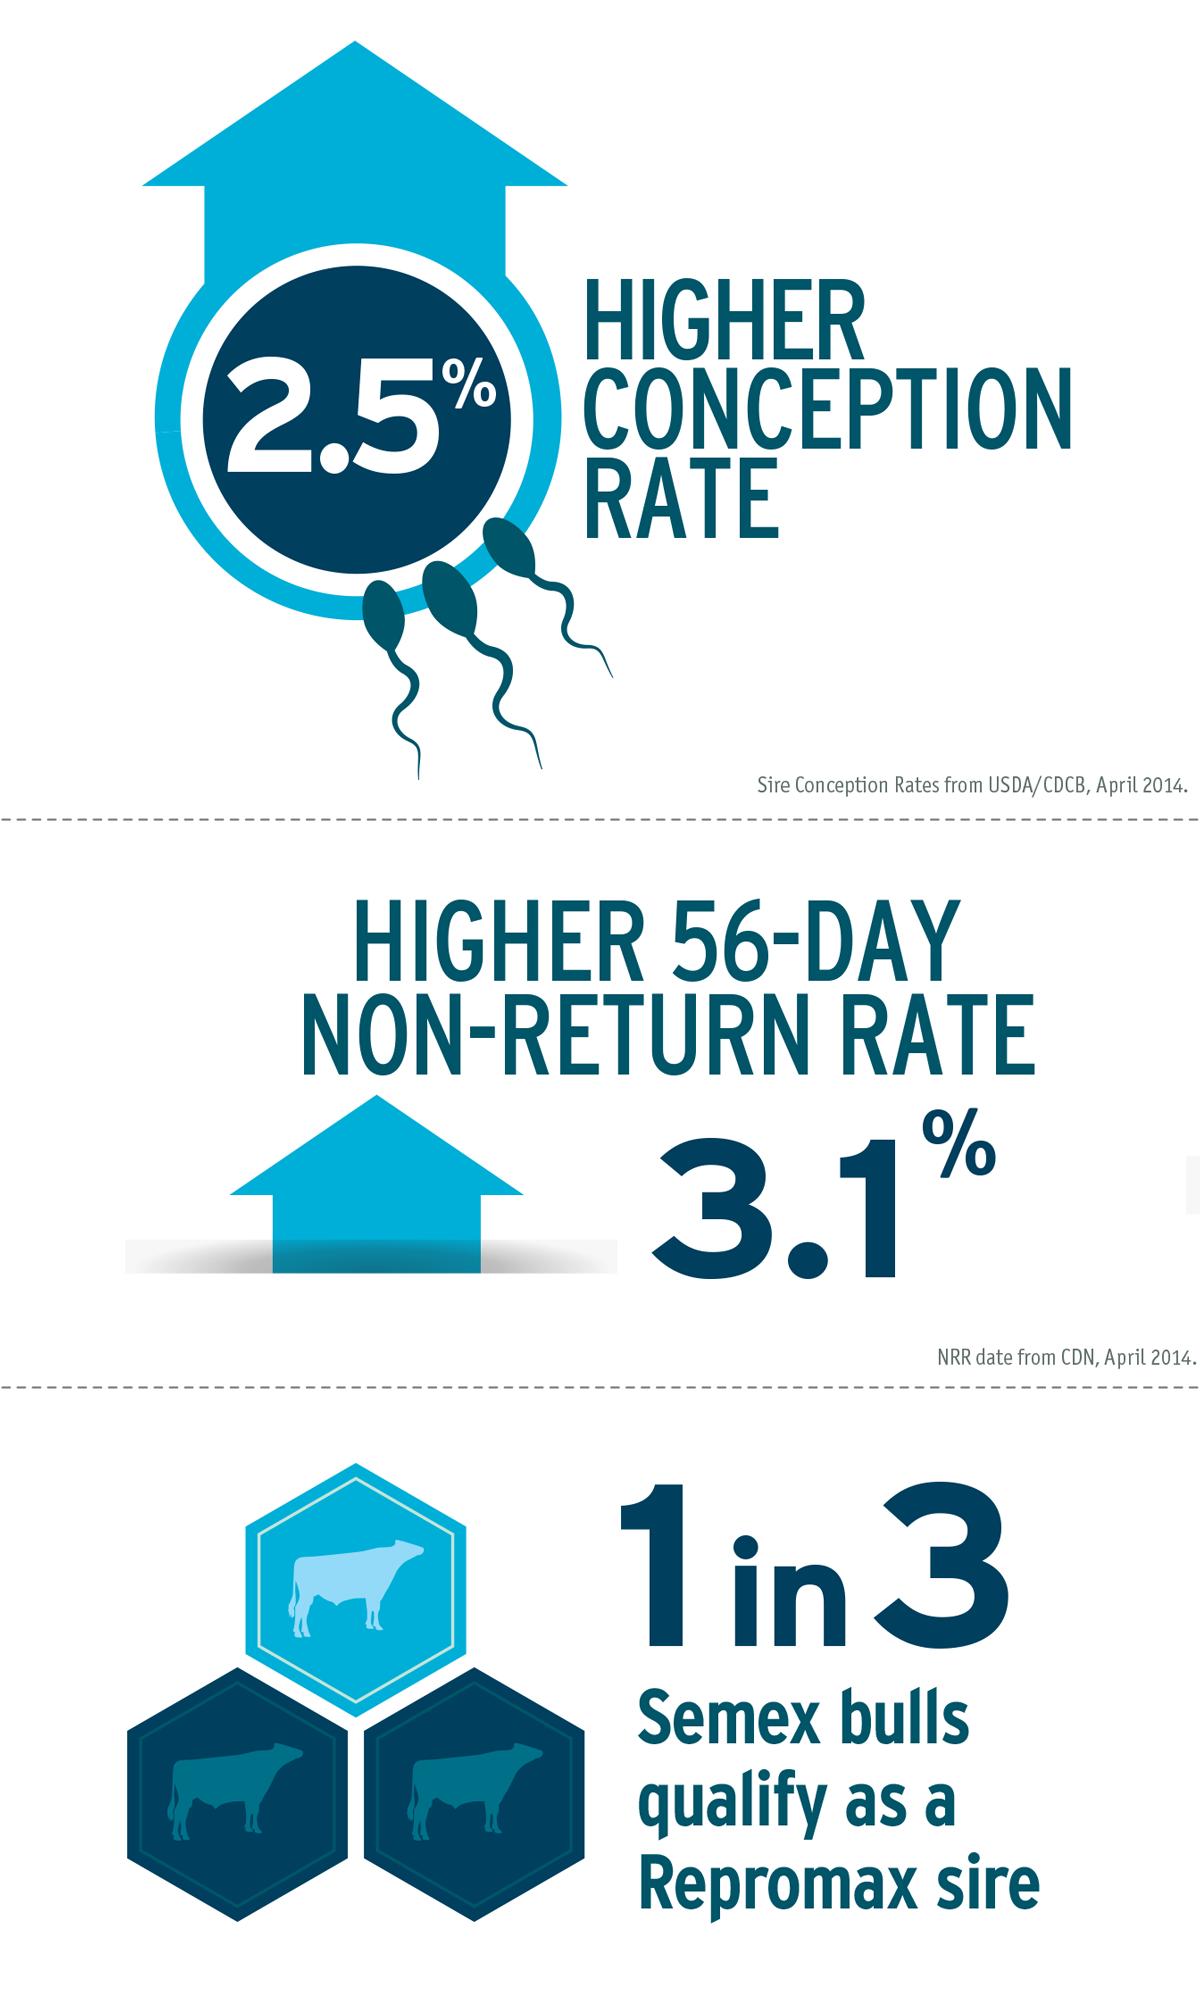 Repromax-infographic1